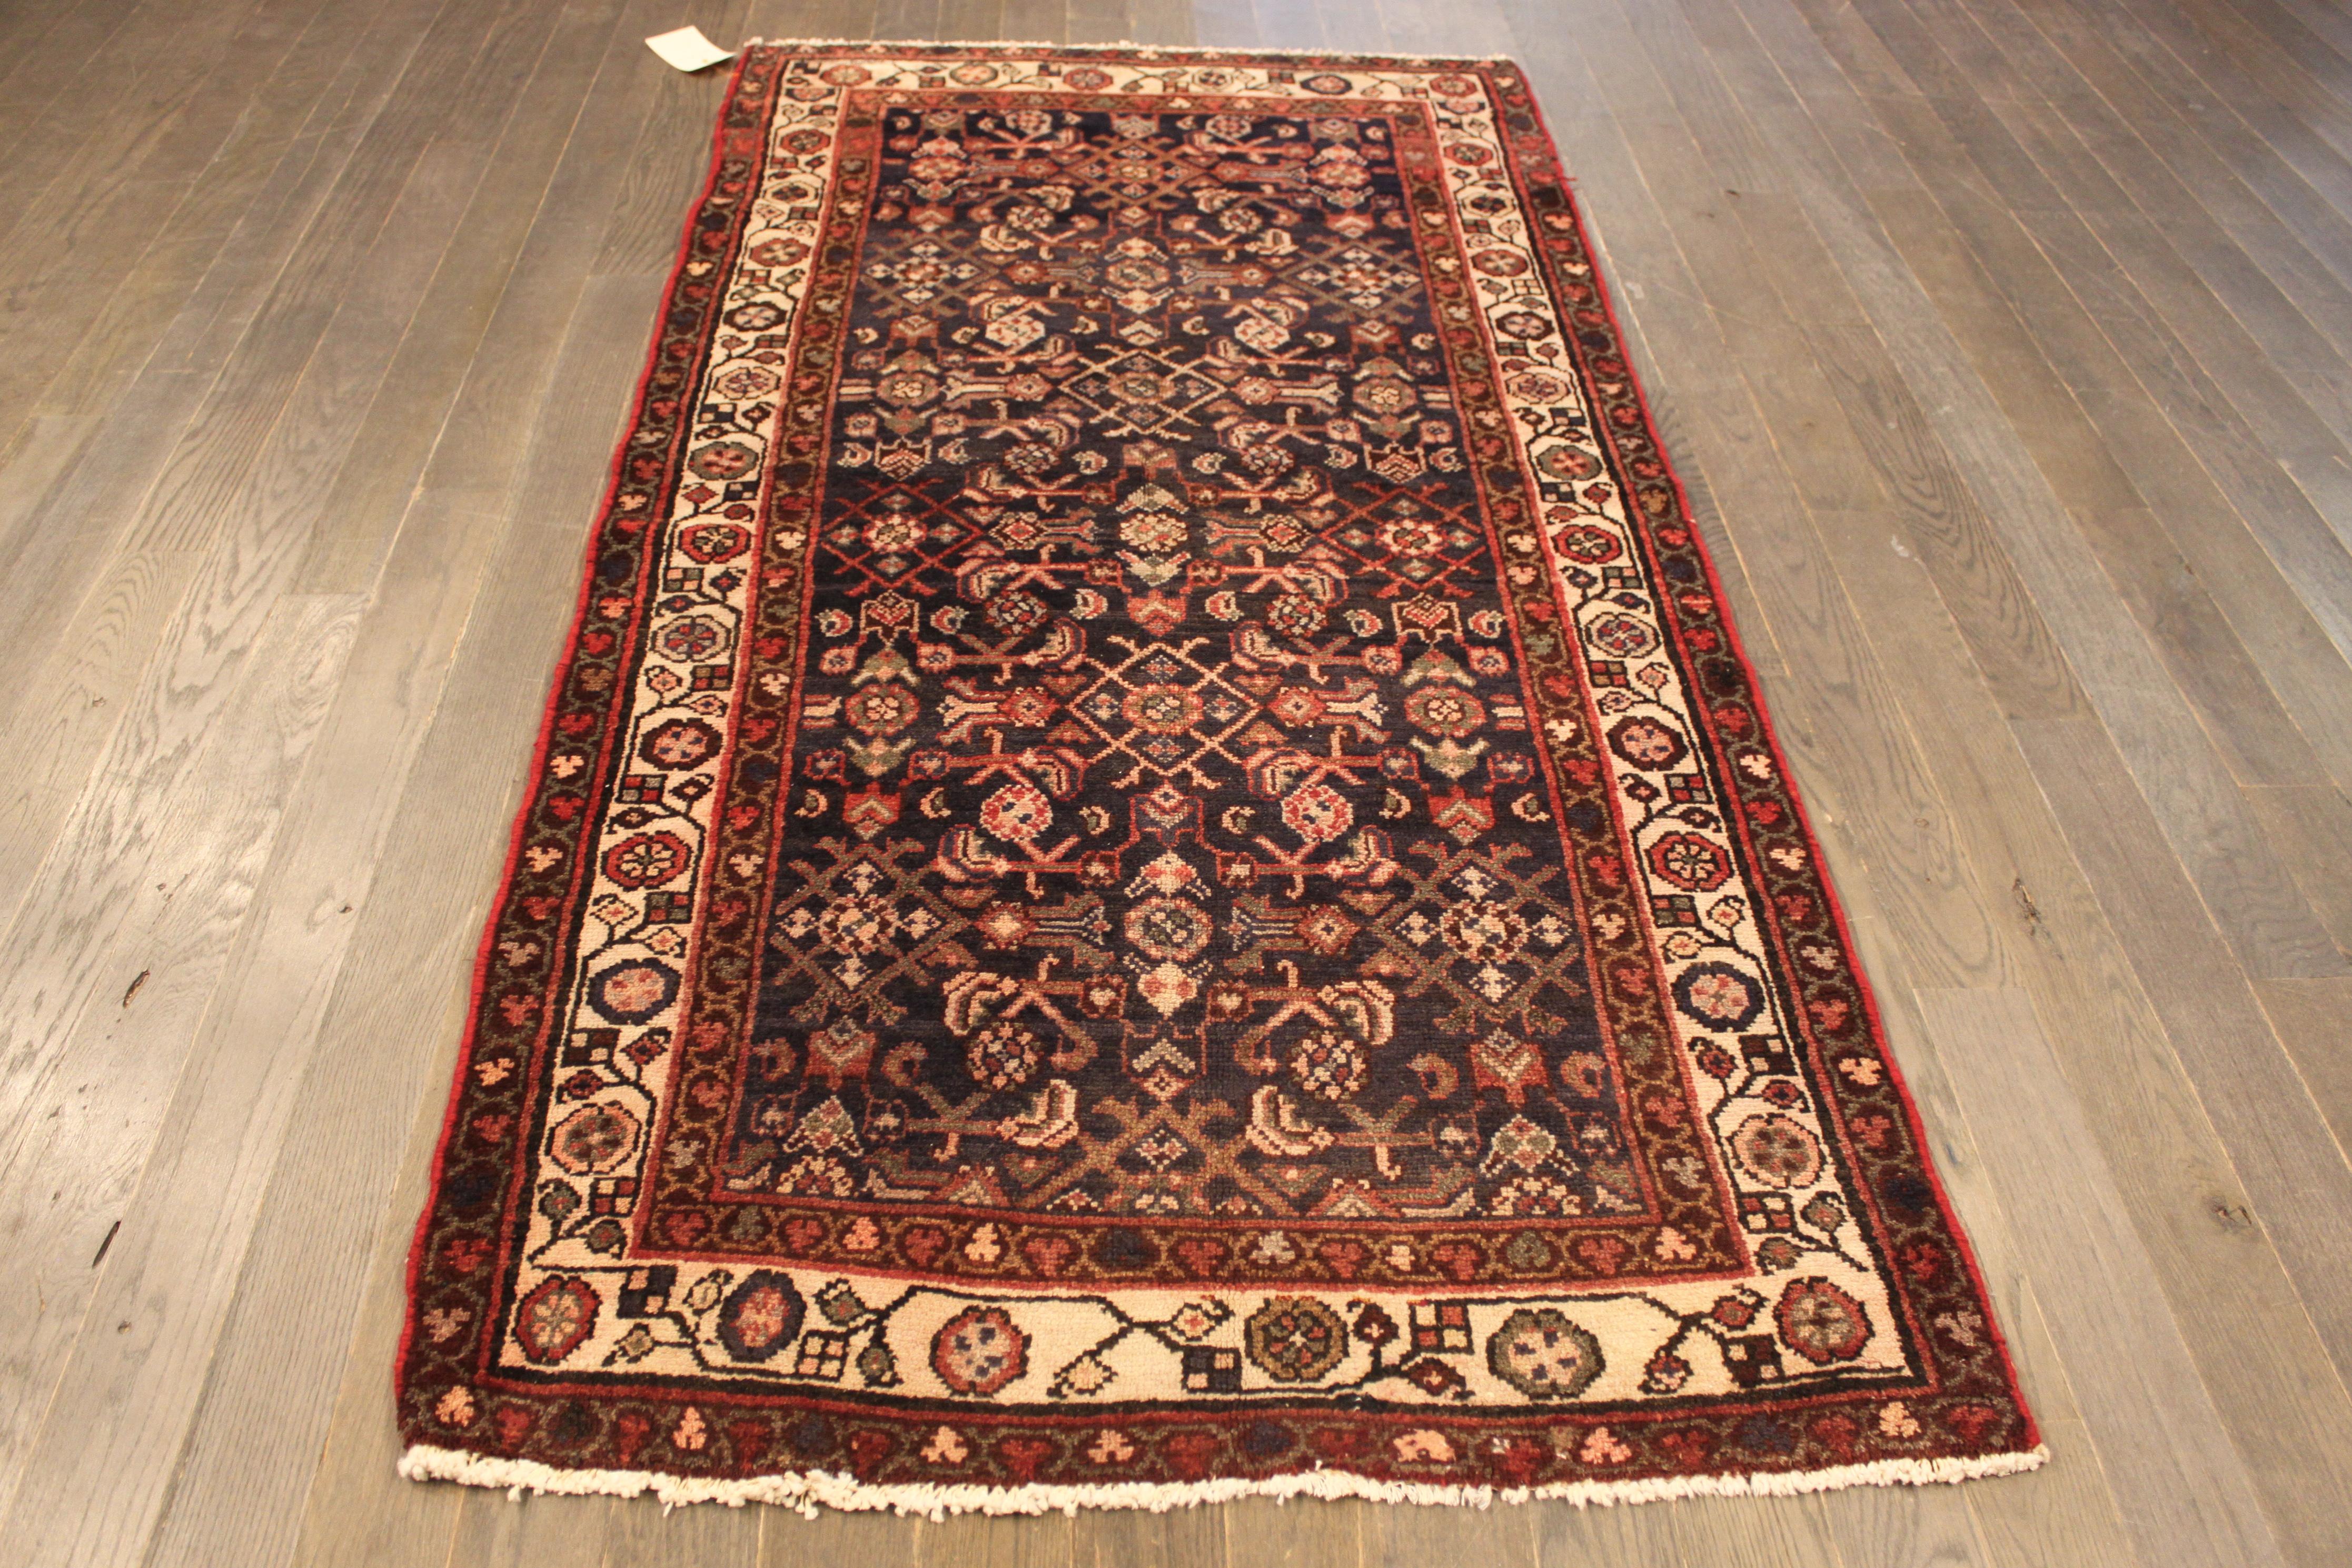 Vintage Persian Wool Rug 3 2 Quot X 6 5 Quot Chairish